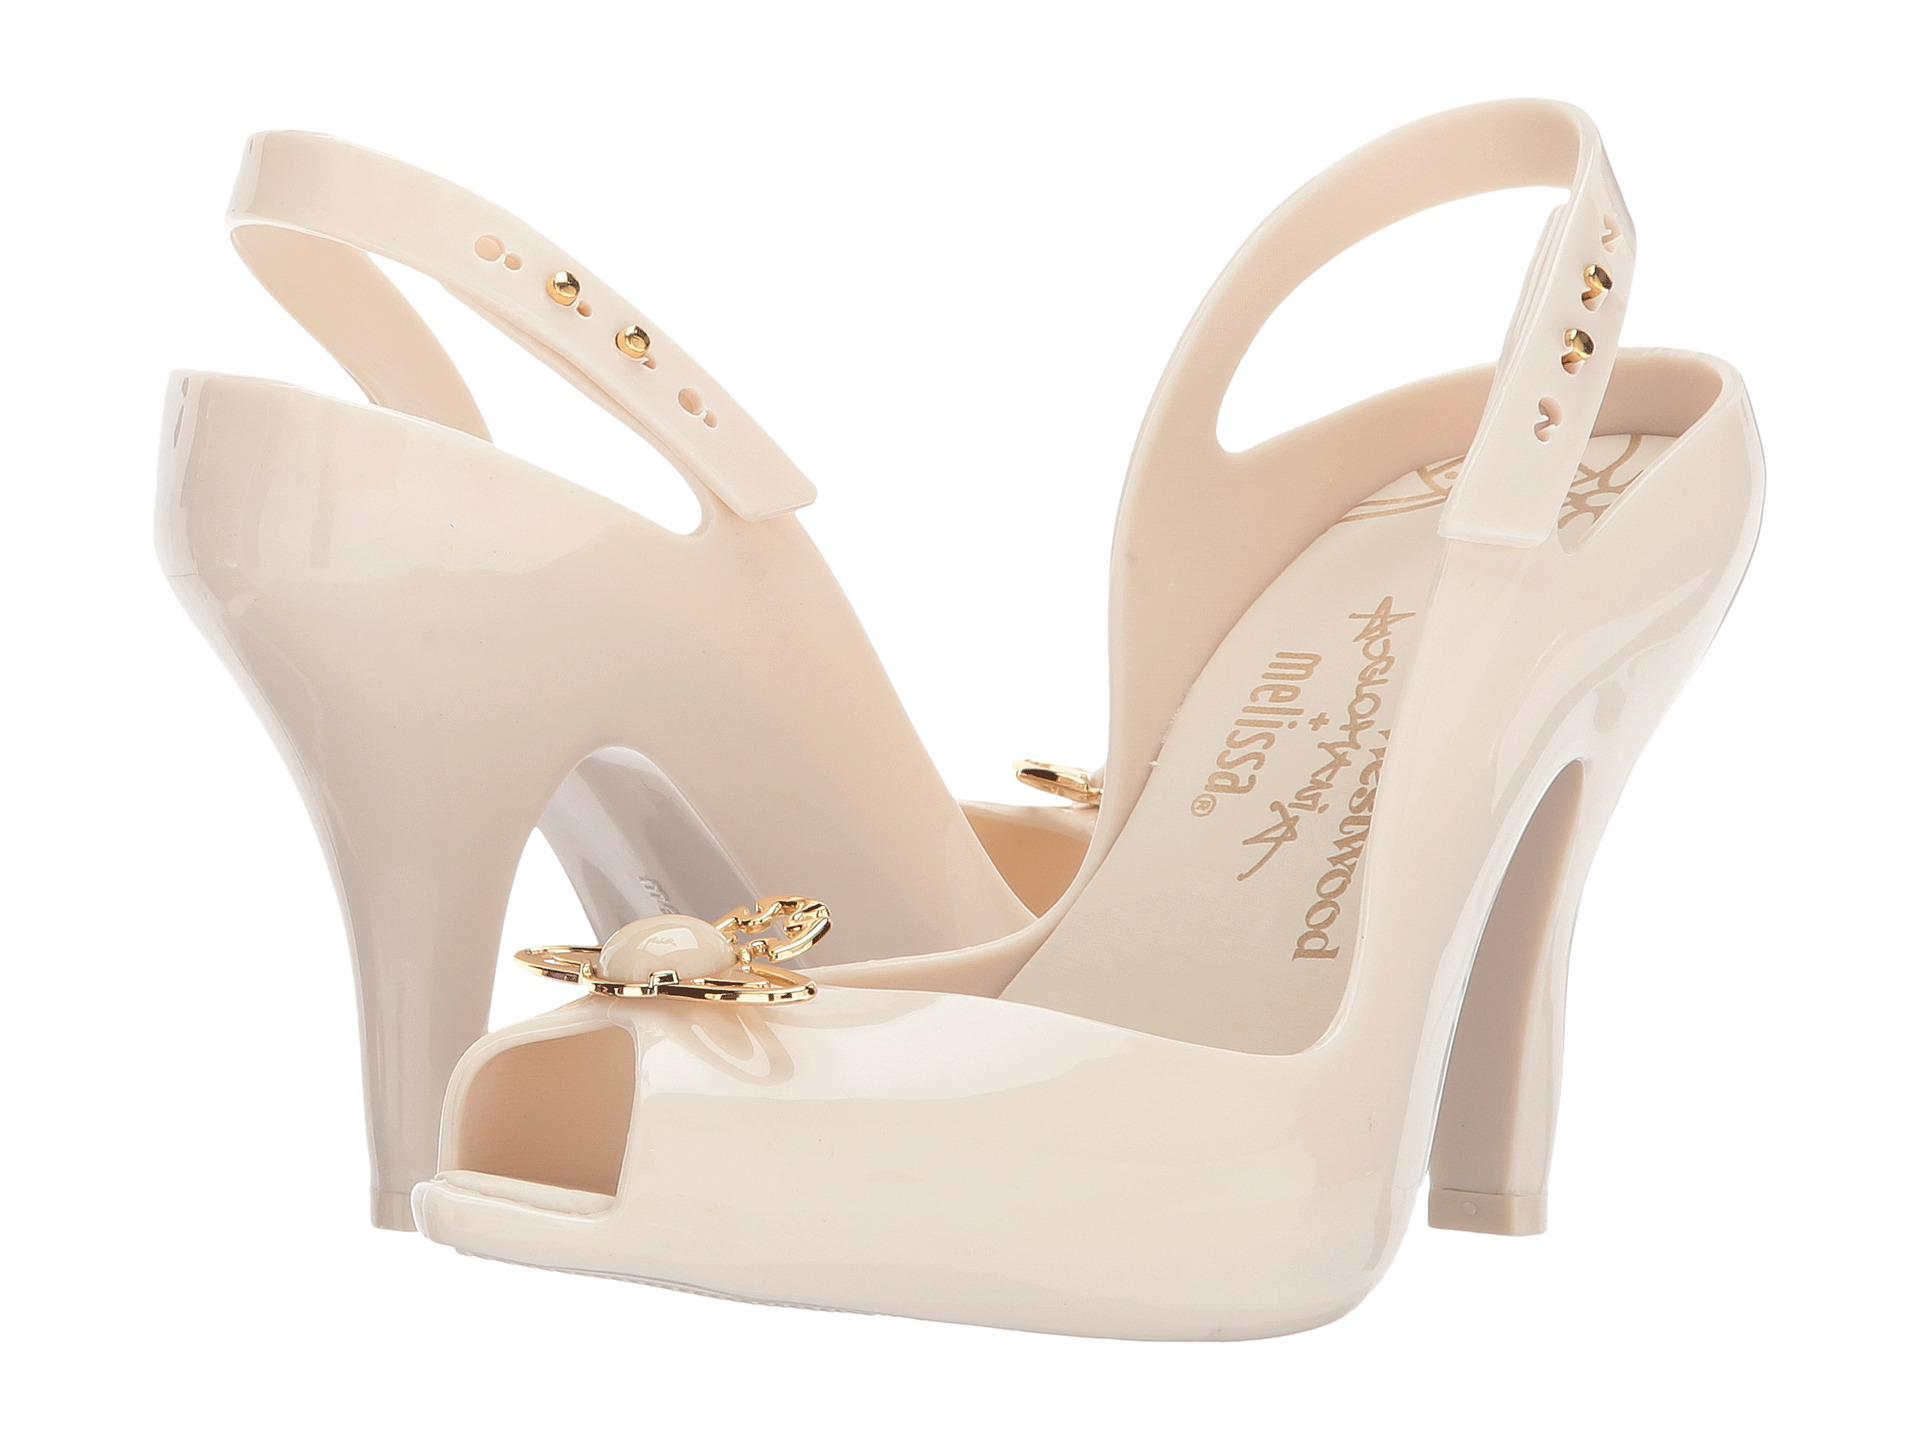 + Melissa Luxury Shoes Vivienne Westwood Anglomania + Melissa Lady Dragon XIV Uo4yFU